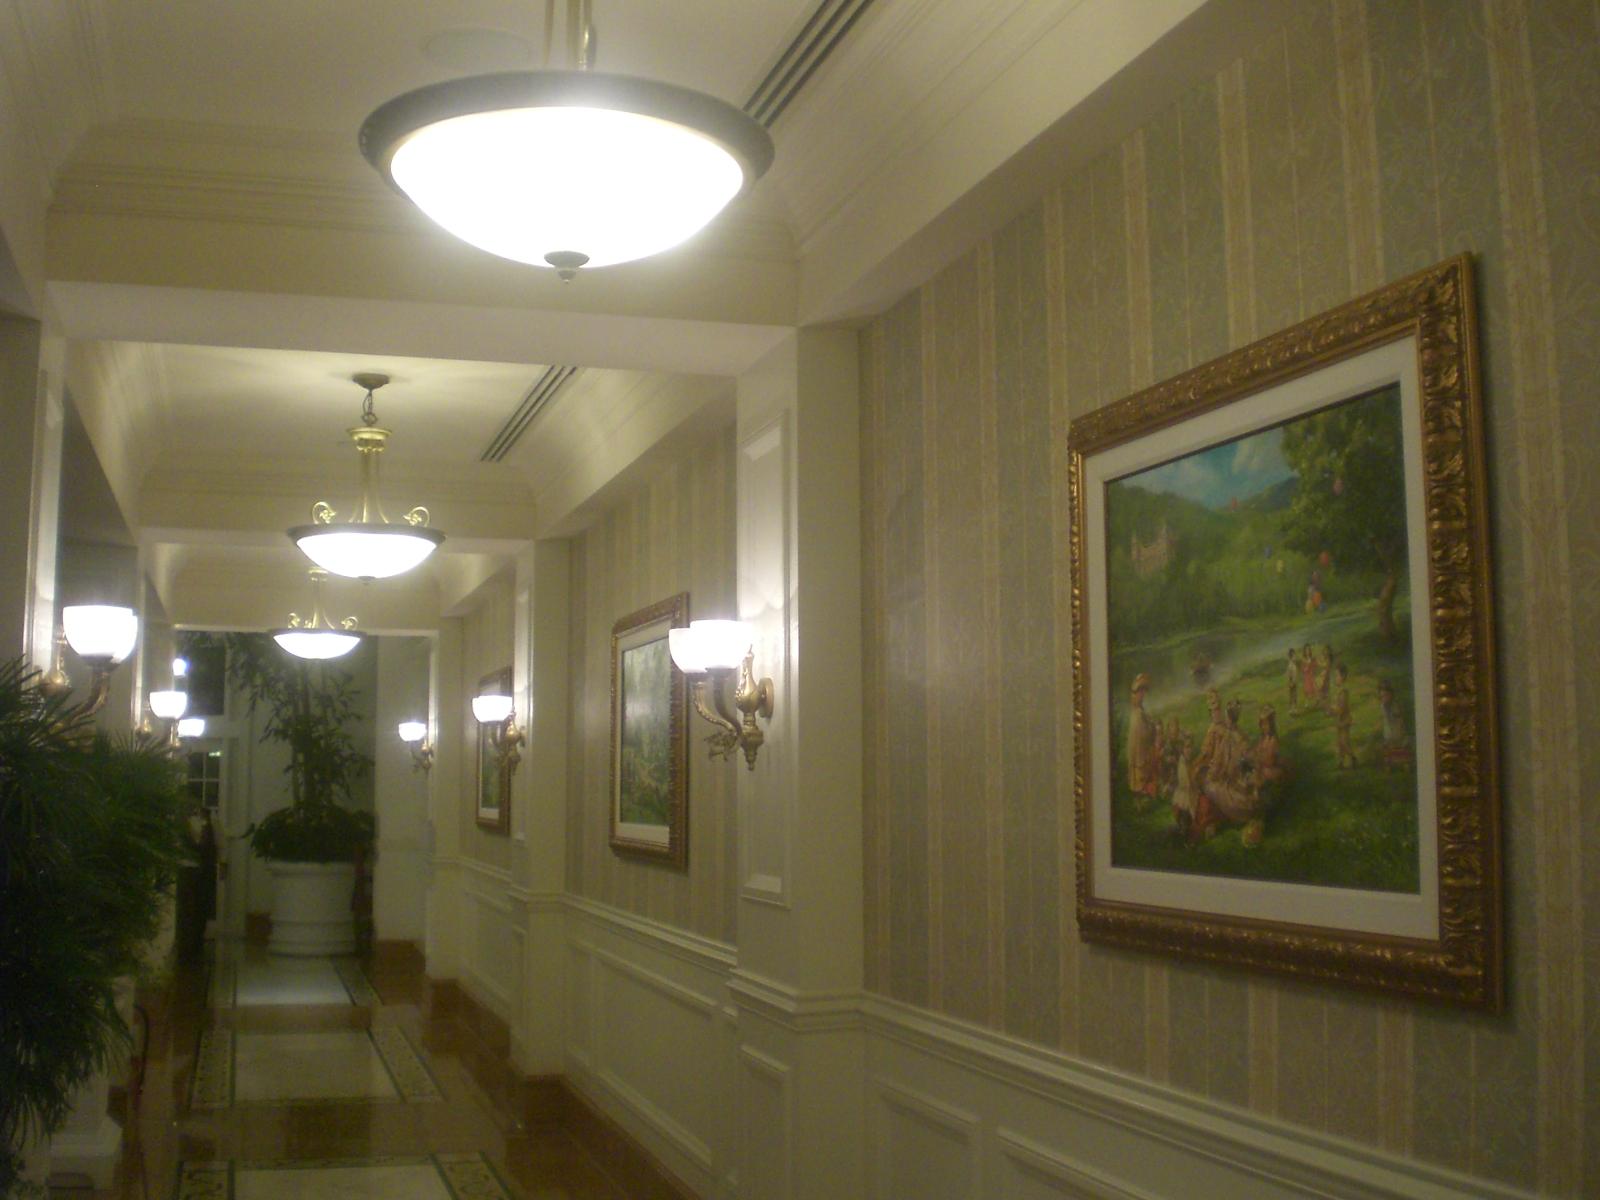 File hk disneyland hotel 3rd floor corridor wallpaper jpg - Wallpaper corridor ...